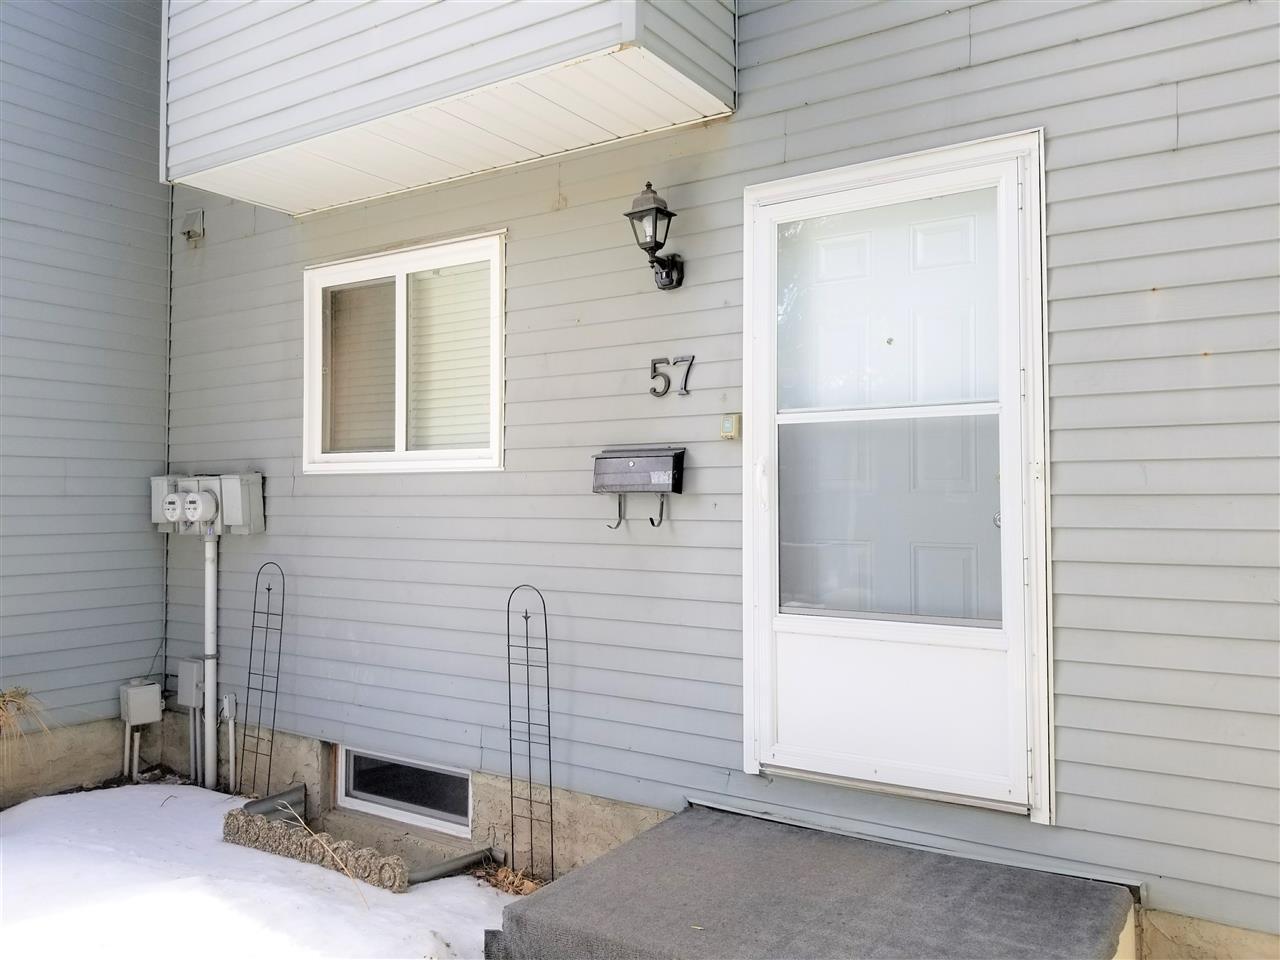 57 1415 62 Street NW, 4 bed, 1.1 bath, at $220,000